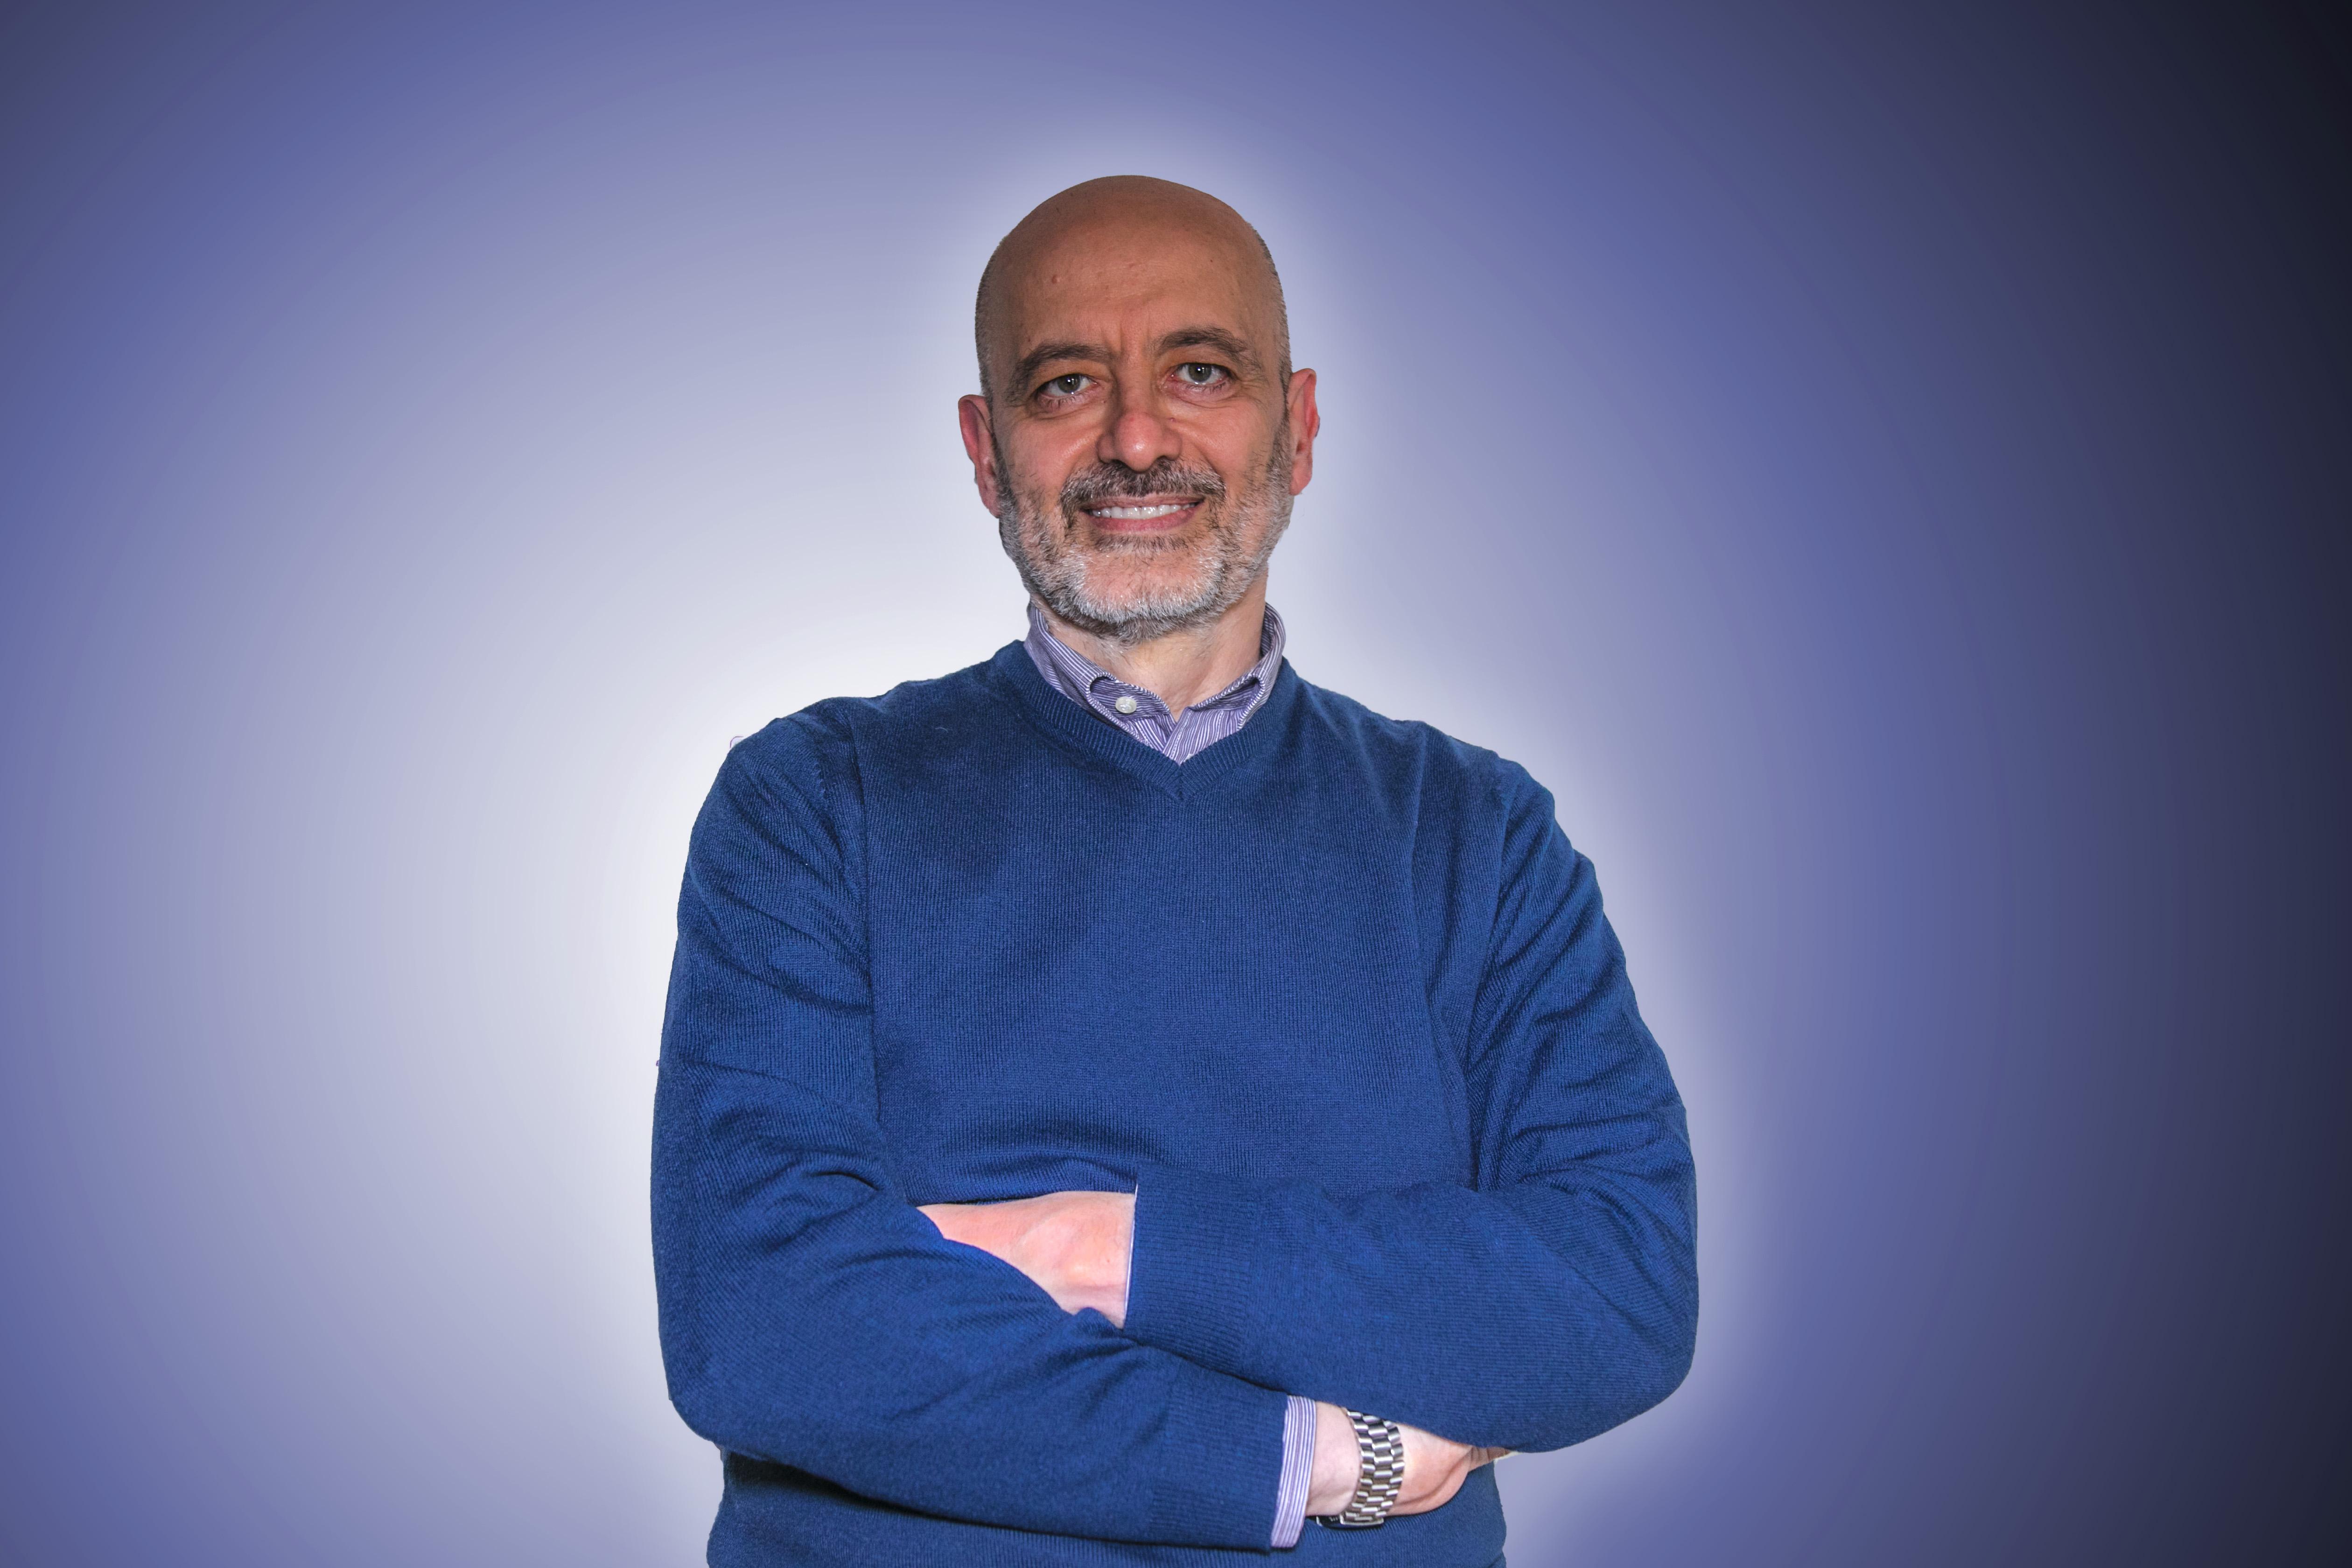 Gianni Quaresima